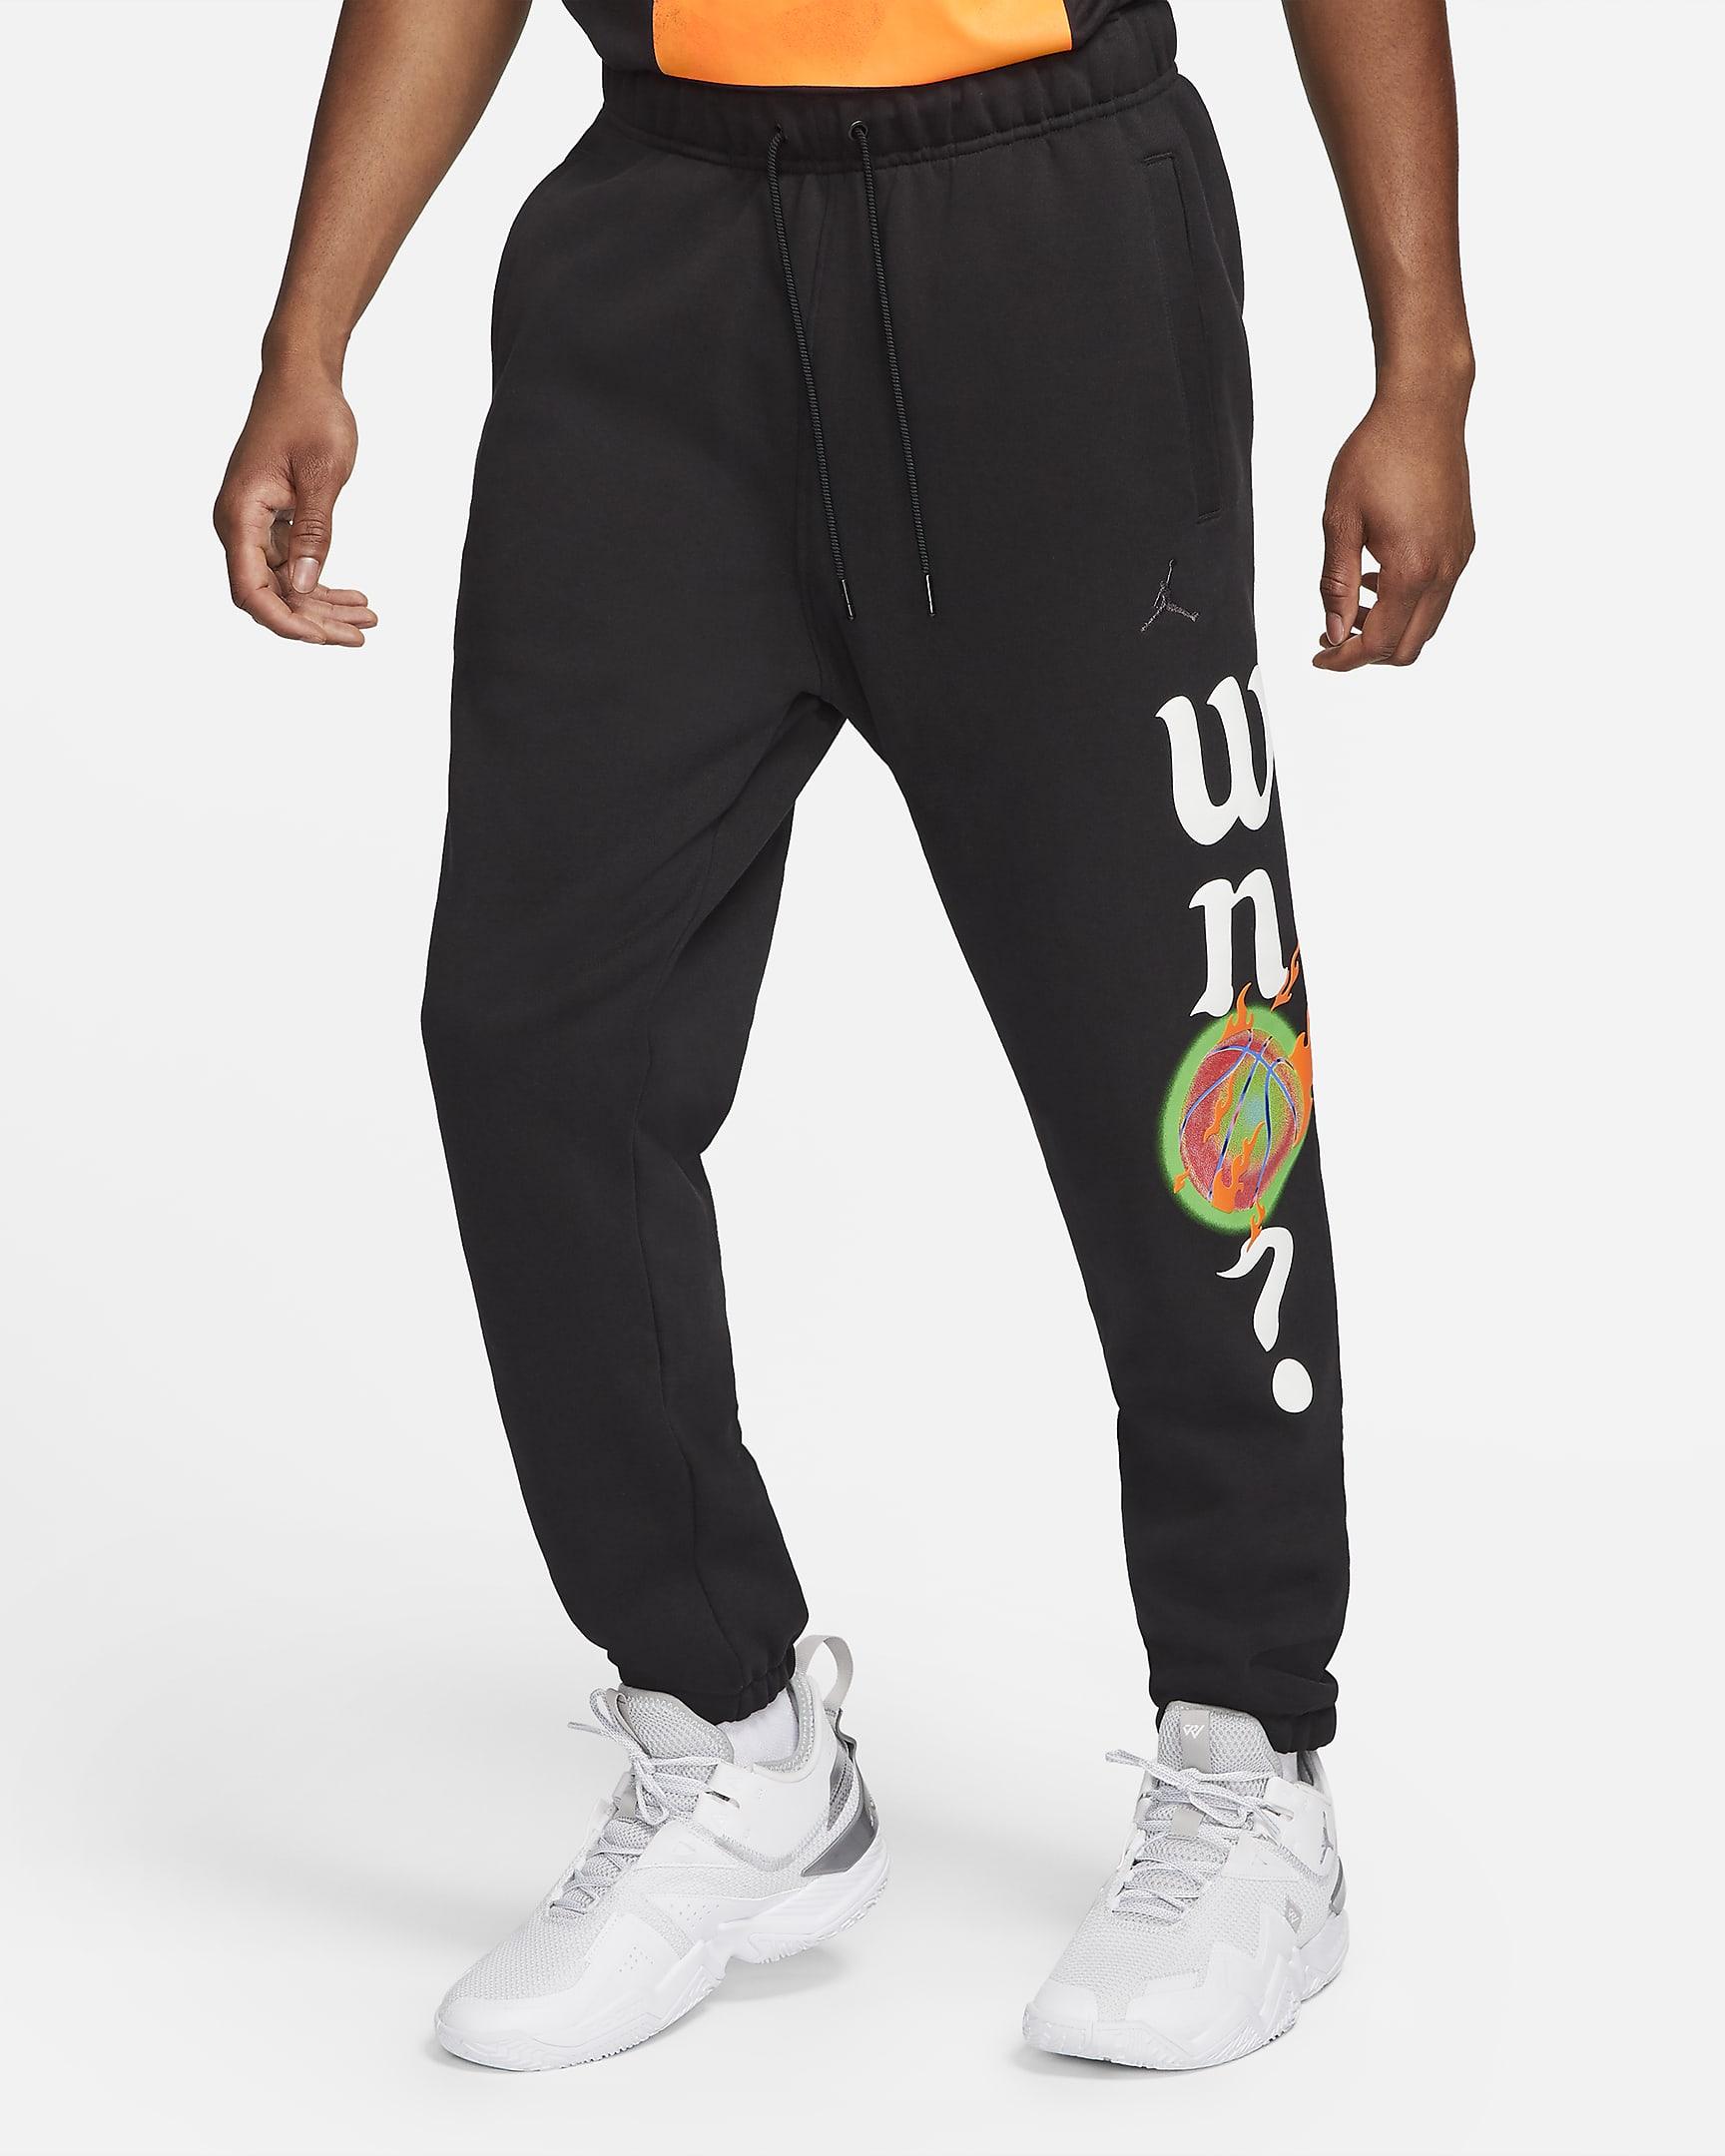 jordan-why-not-fleece-trousers-g30Kvc